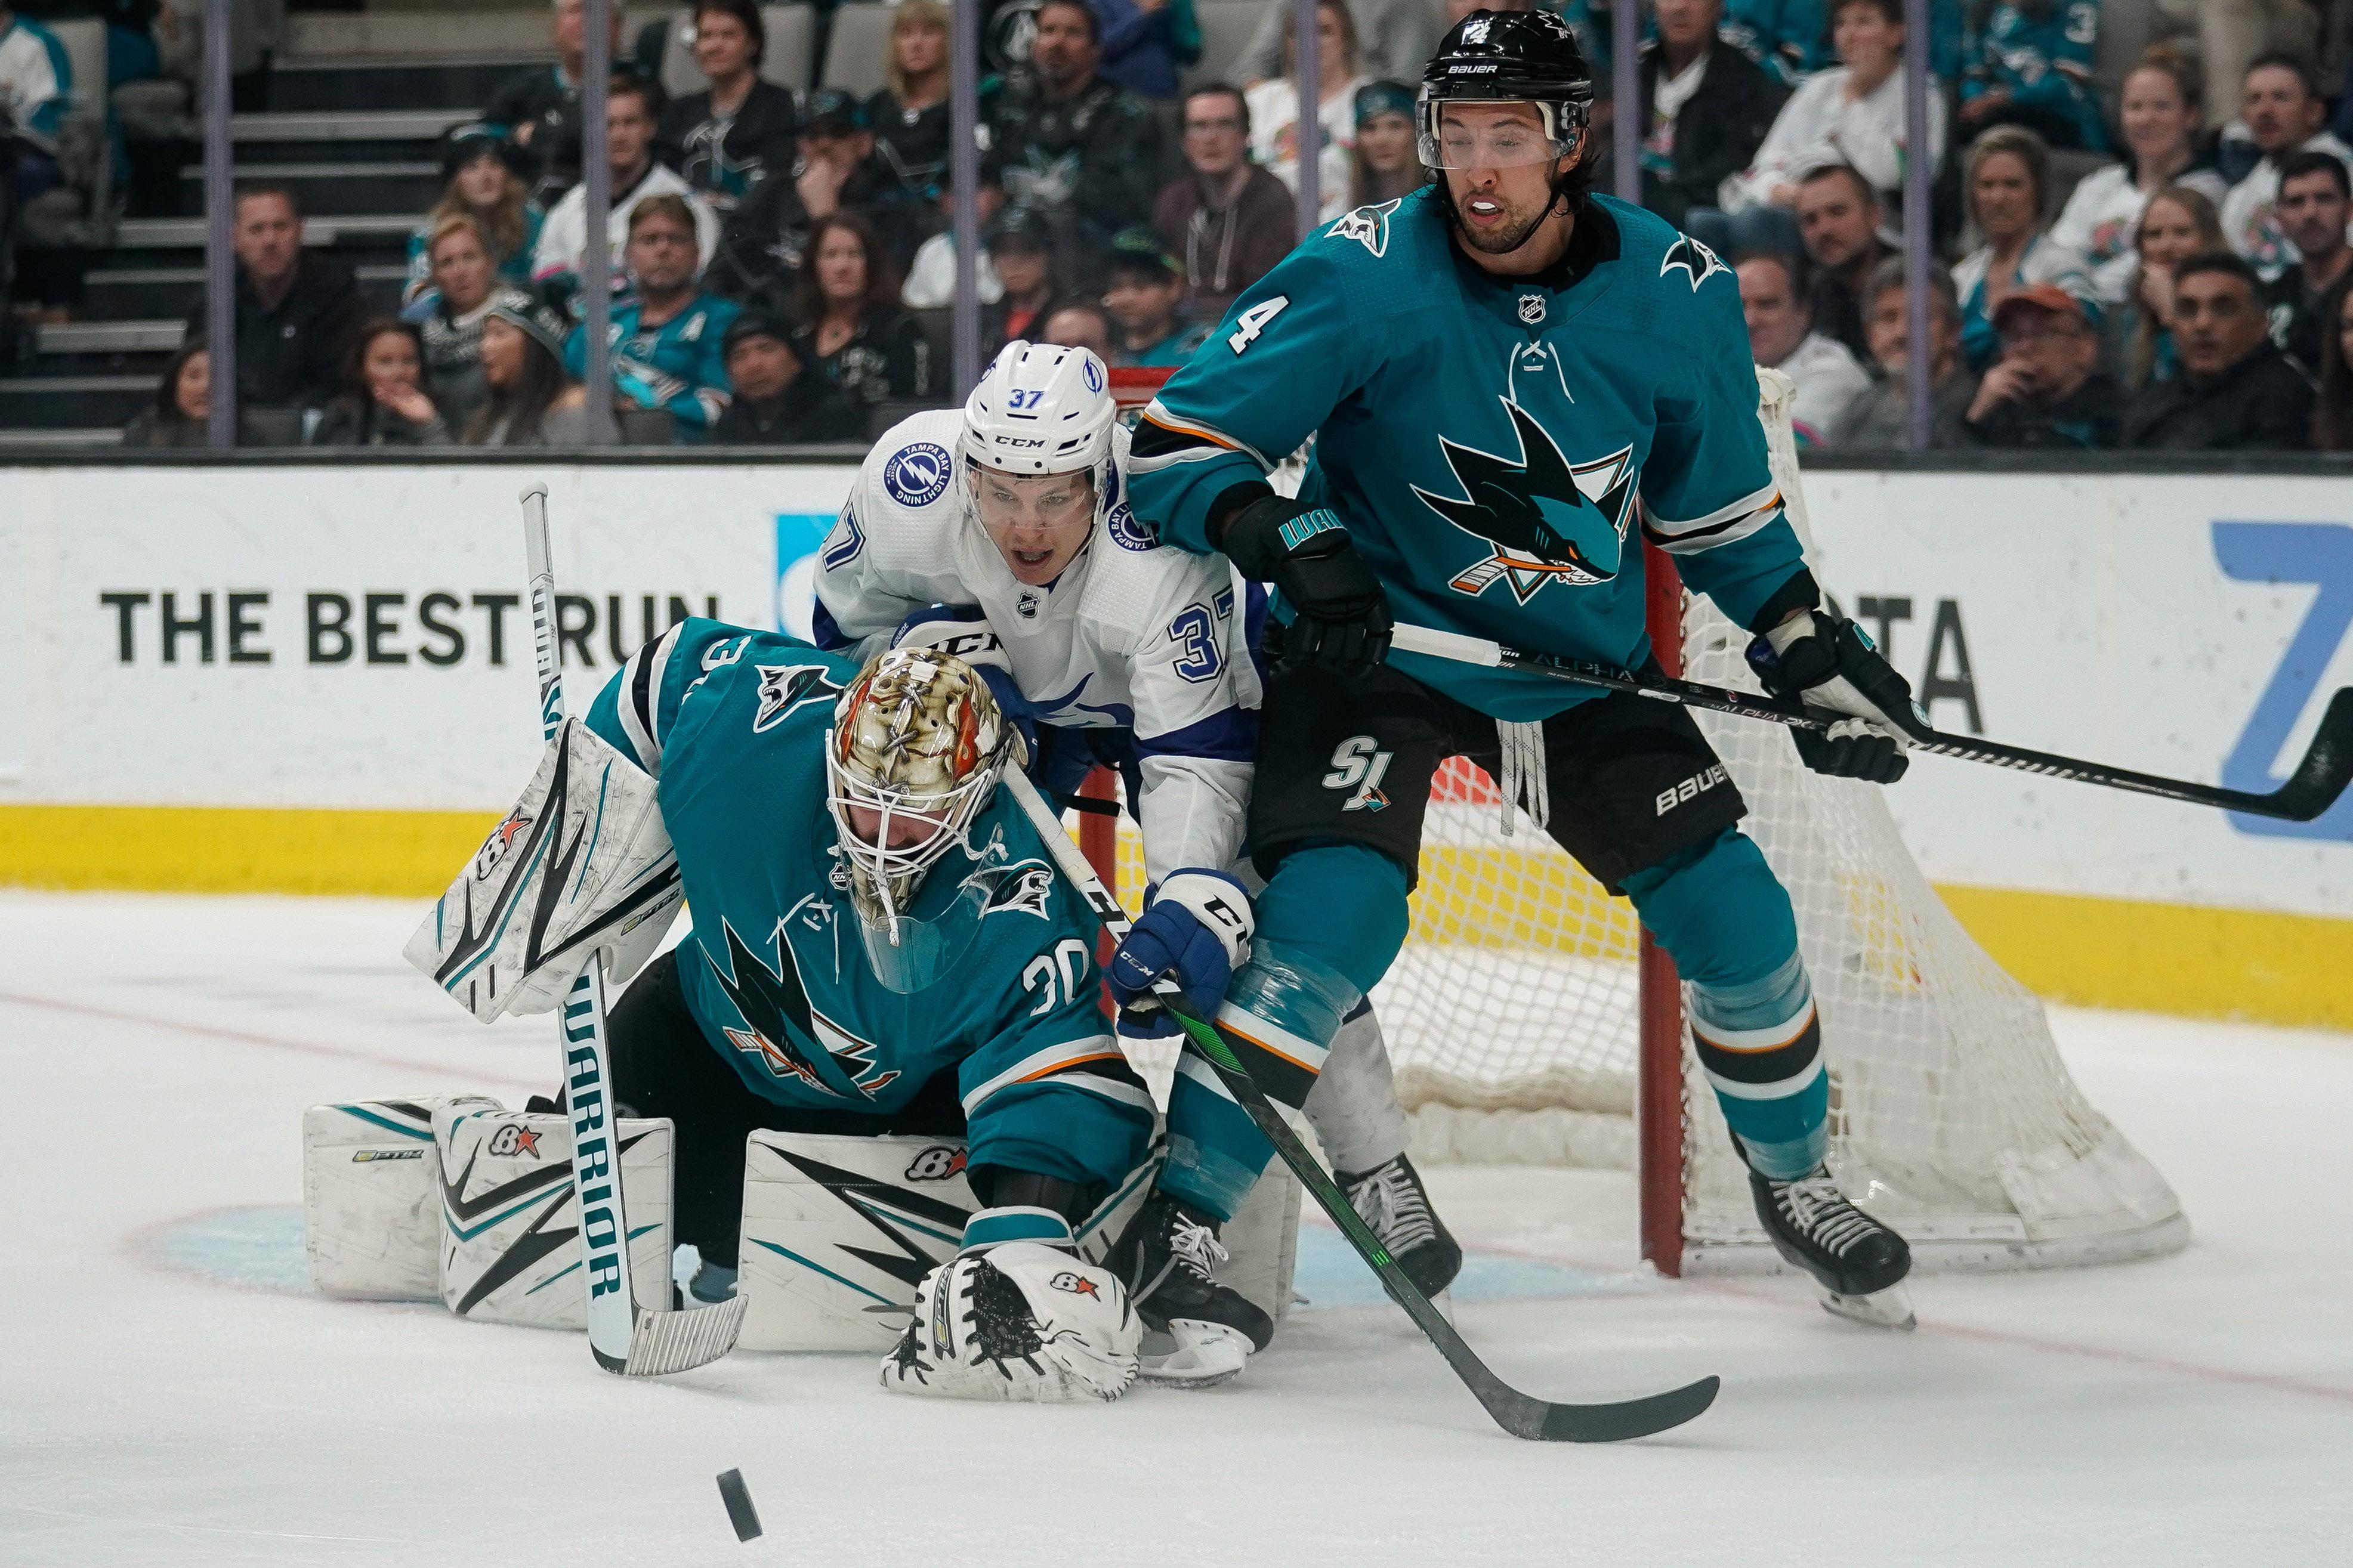 Feb 1, 2020; San Jose, California, USA; San Jose Sharks goaltender Aaron Dell (30) and defenseman Brenden Dillon (4) defend the goal from Tampa Bay Lightning center Yanni Gourde (37) during the third period at SAP Center at San Jose.